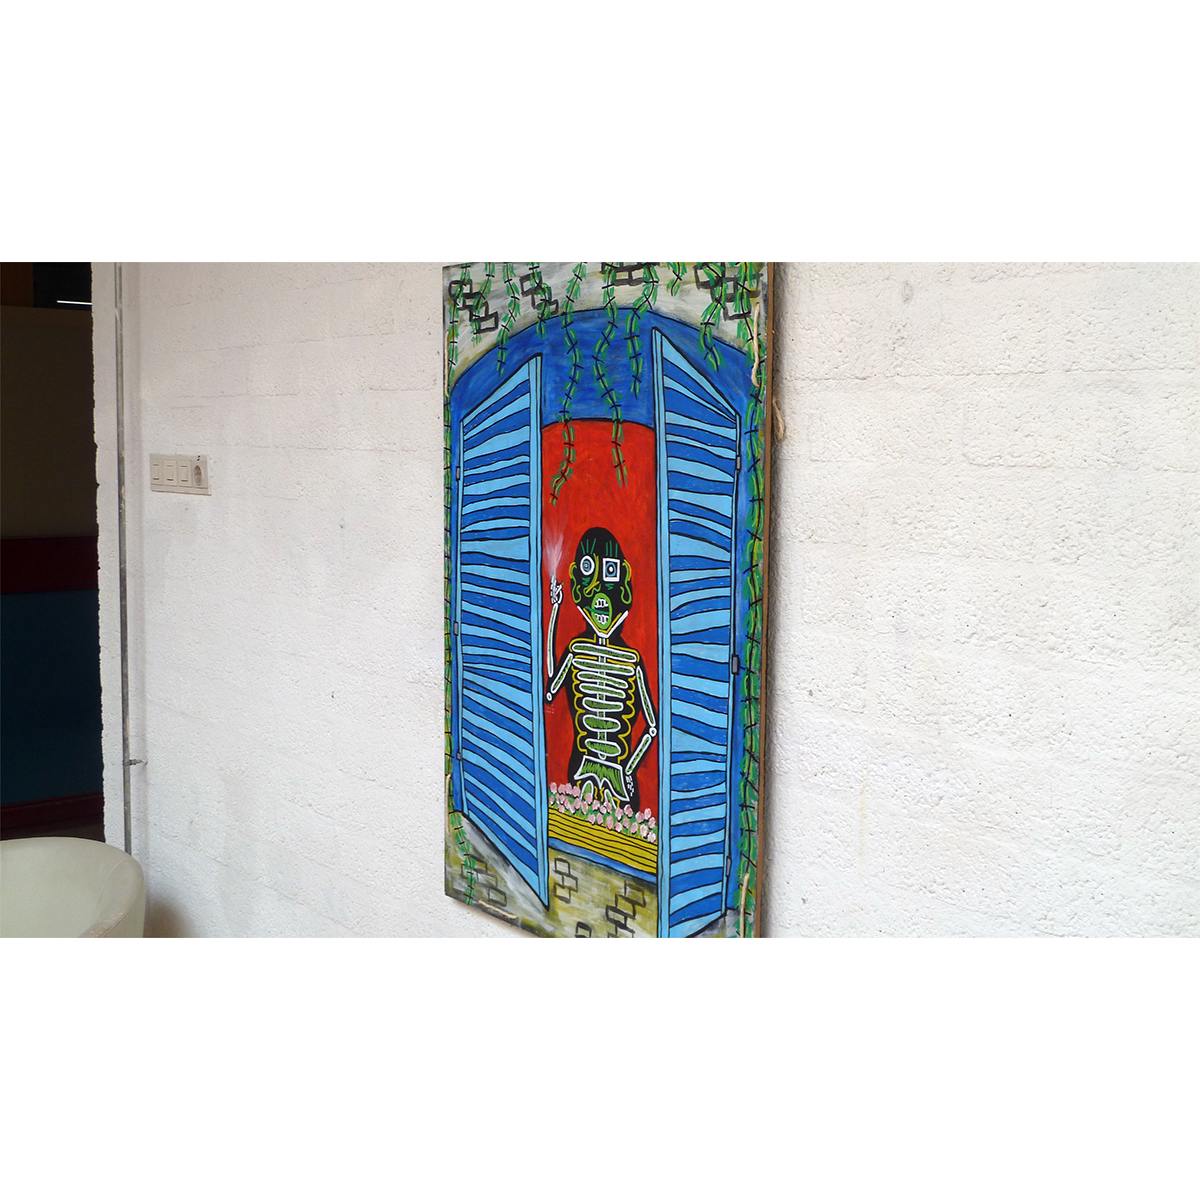 FRENCH WINDOW SMOKER 03 - Frank Willems